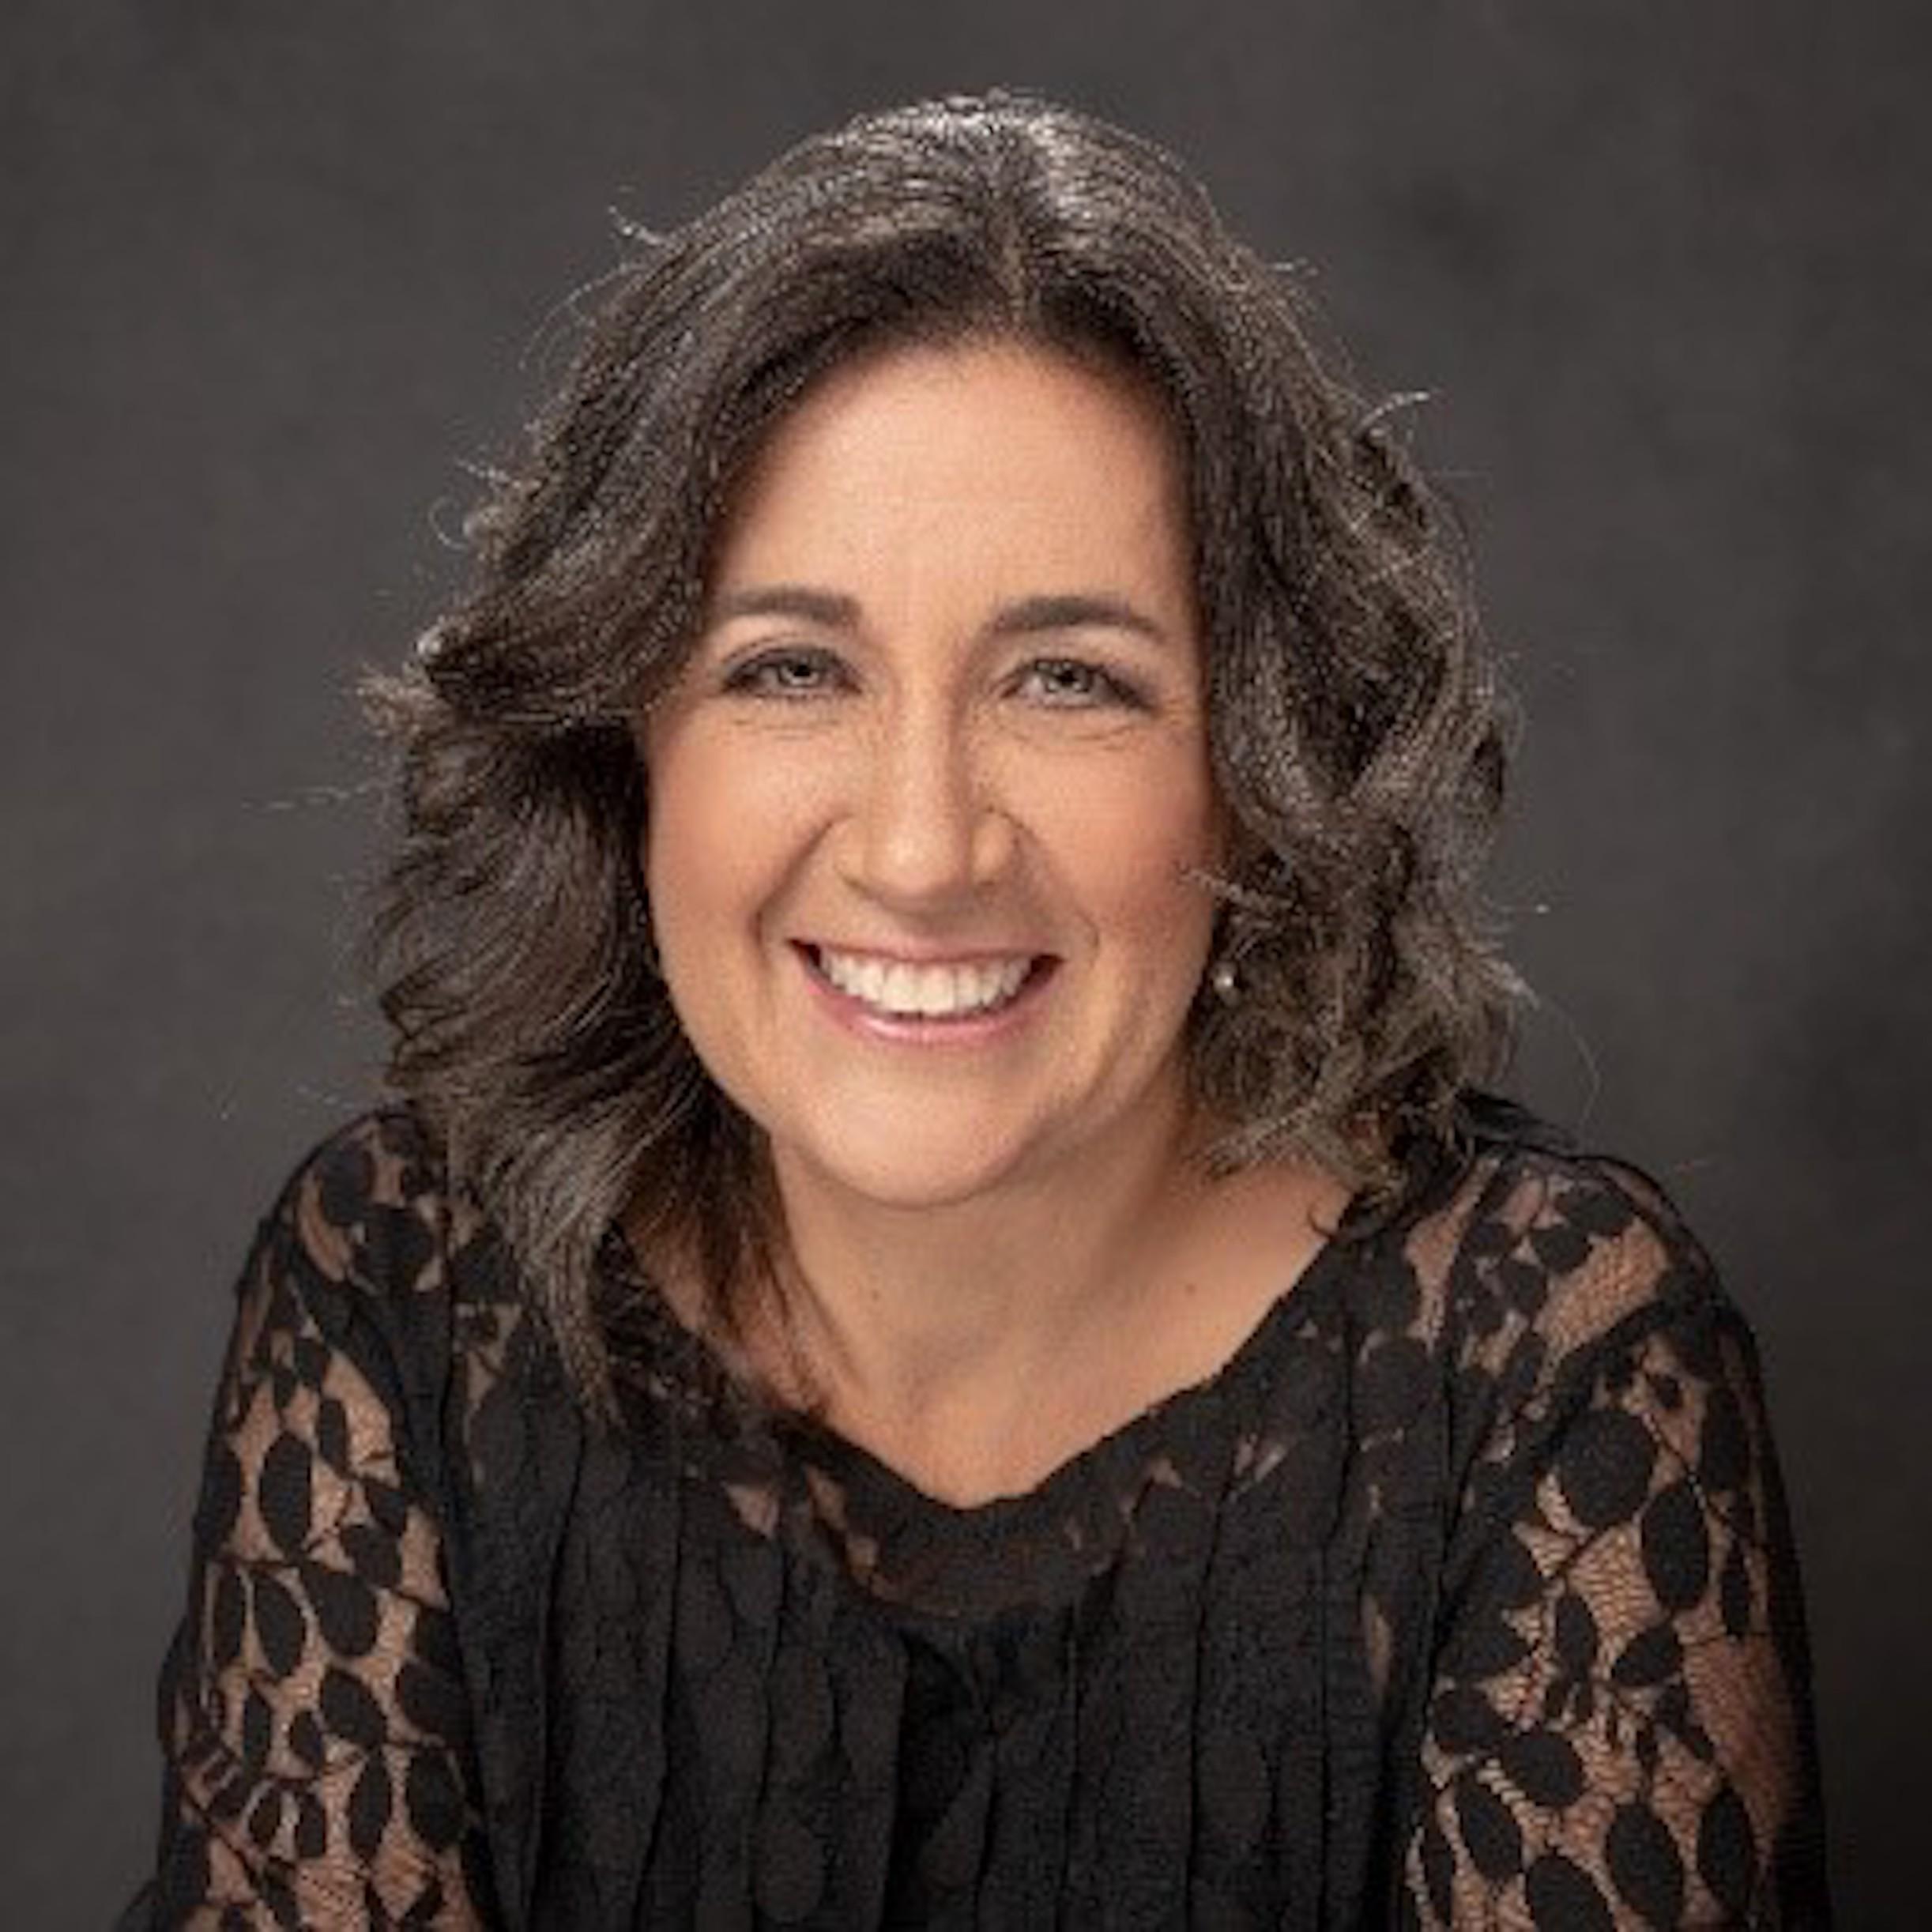 Patti Ordonez Promotes Women in Computing!